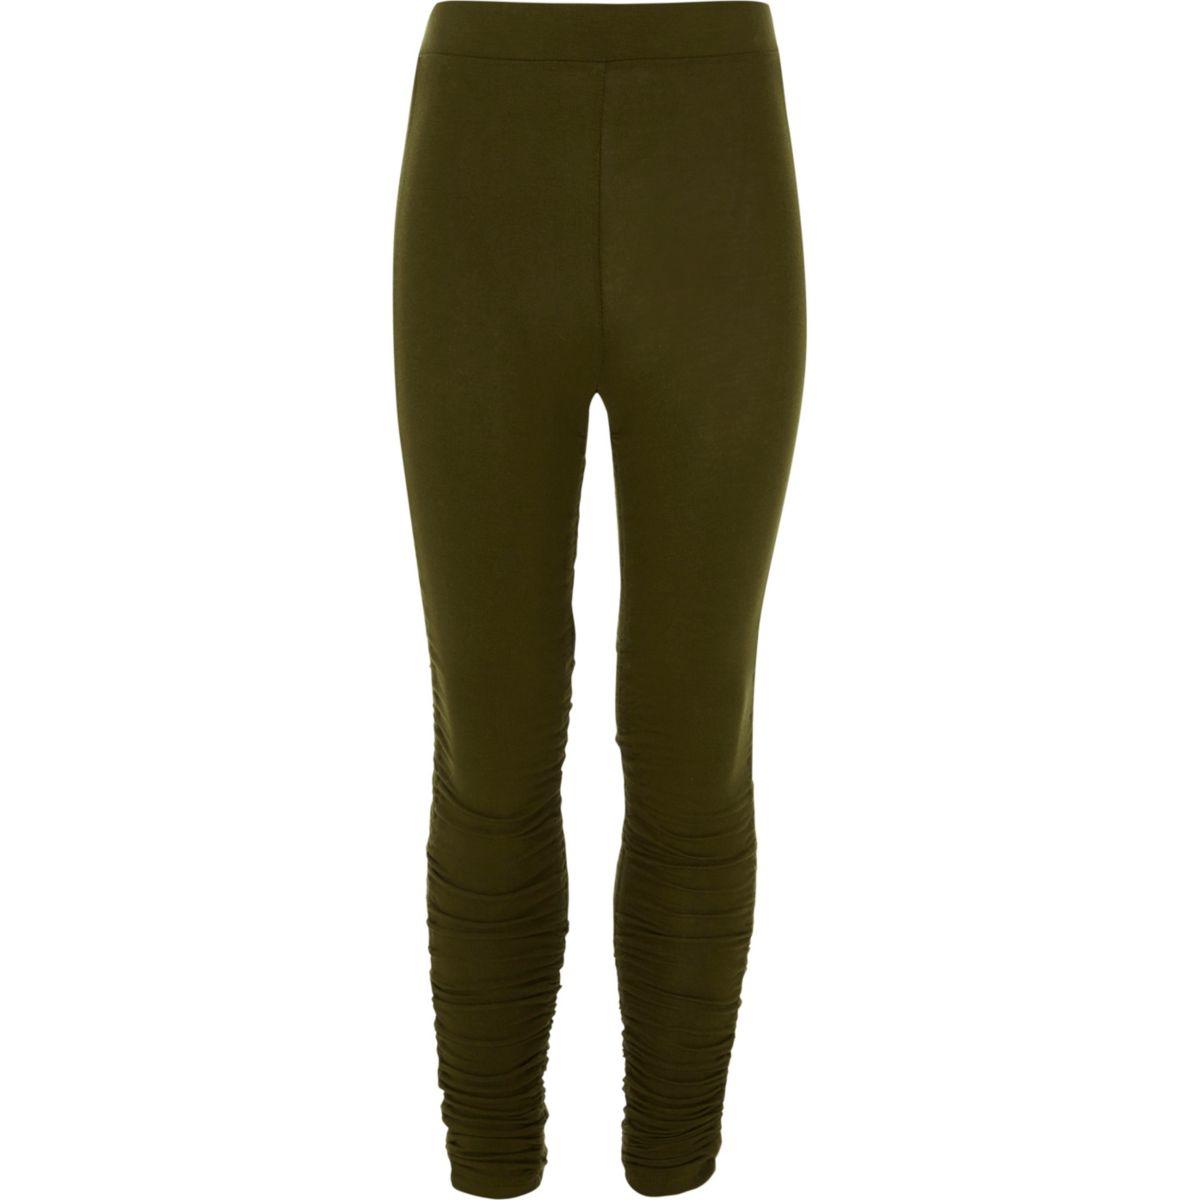 Girls khaki ruched side leggings